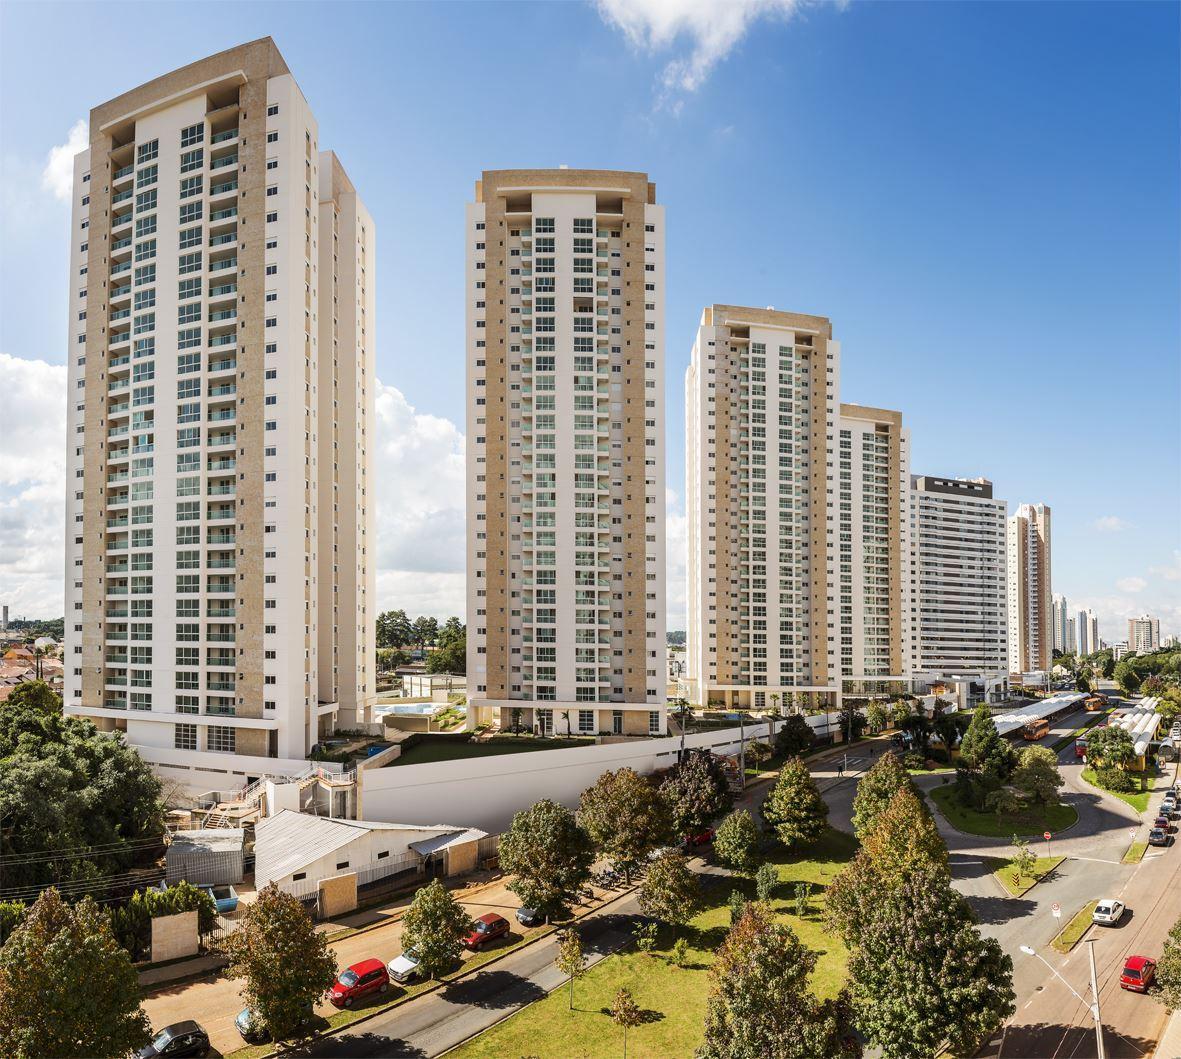 Excelente Apartamento 4 Dorm. 1 Suíte 218 m² 9º Andar Sacada Churrasqueira 2 Vagas Ecoville Ref. 8093